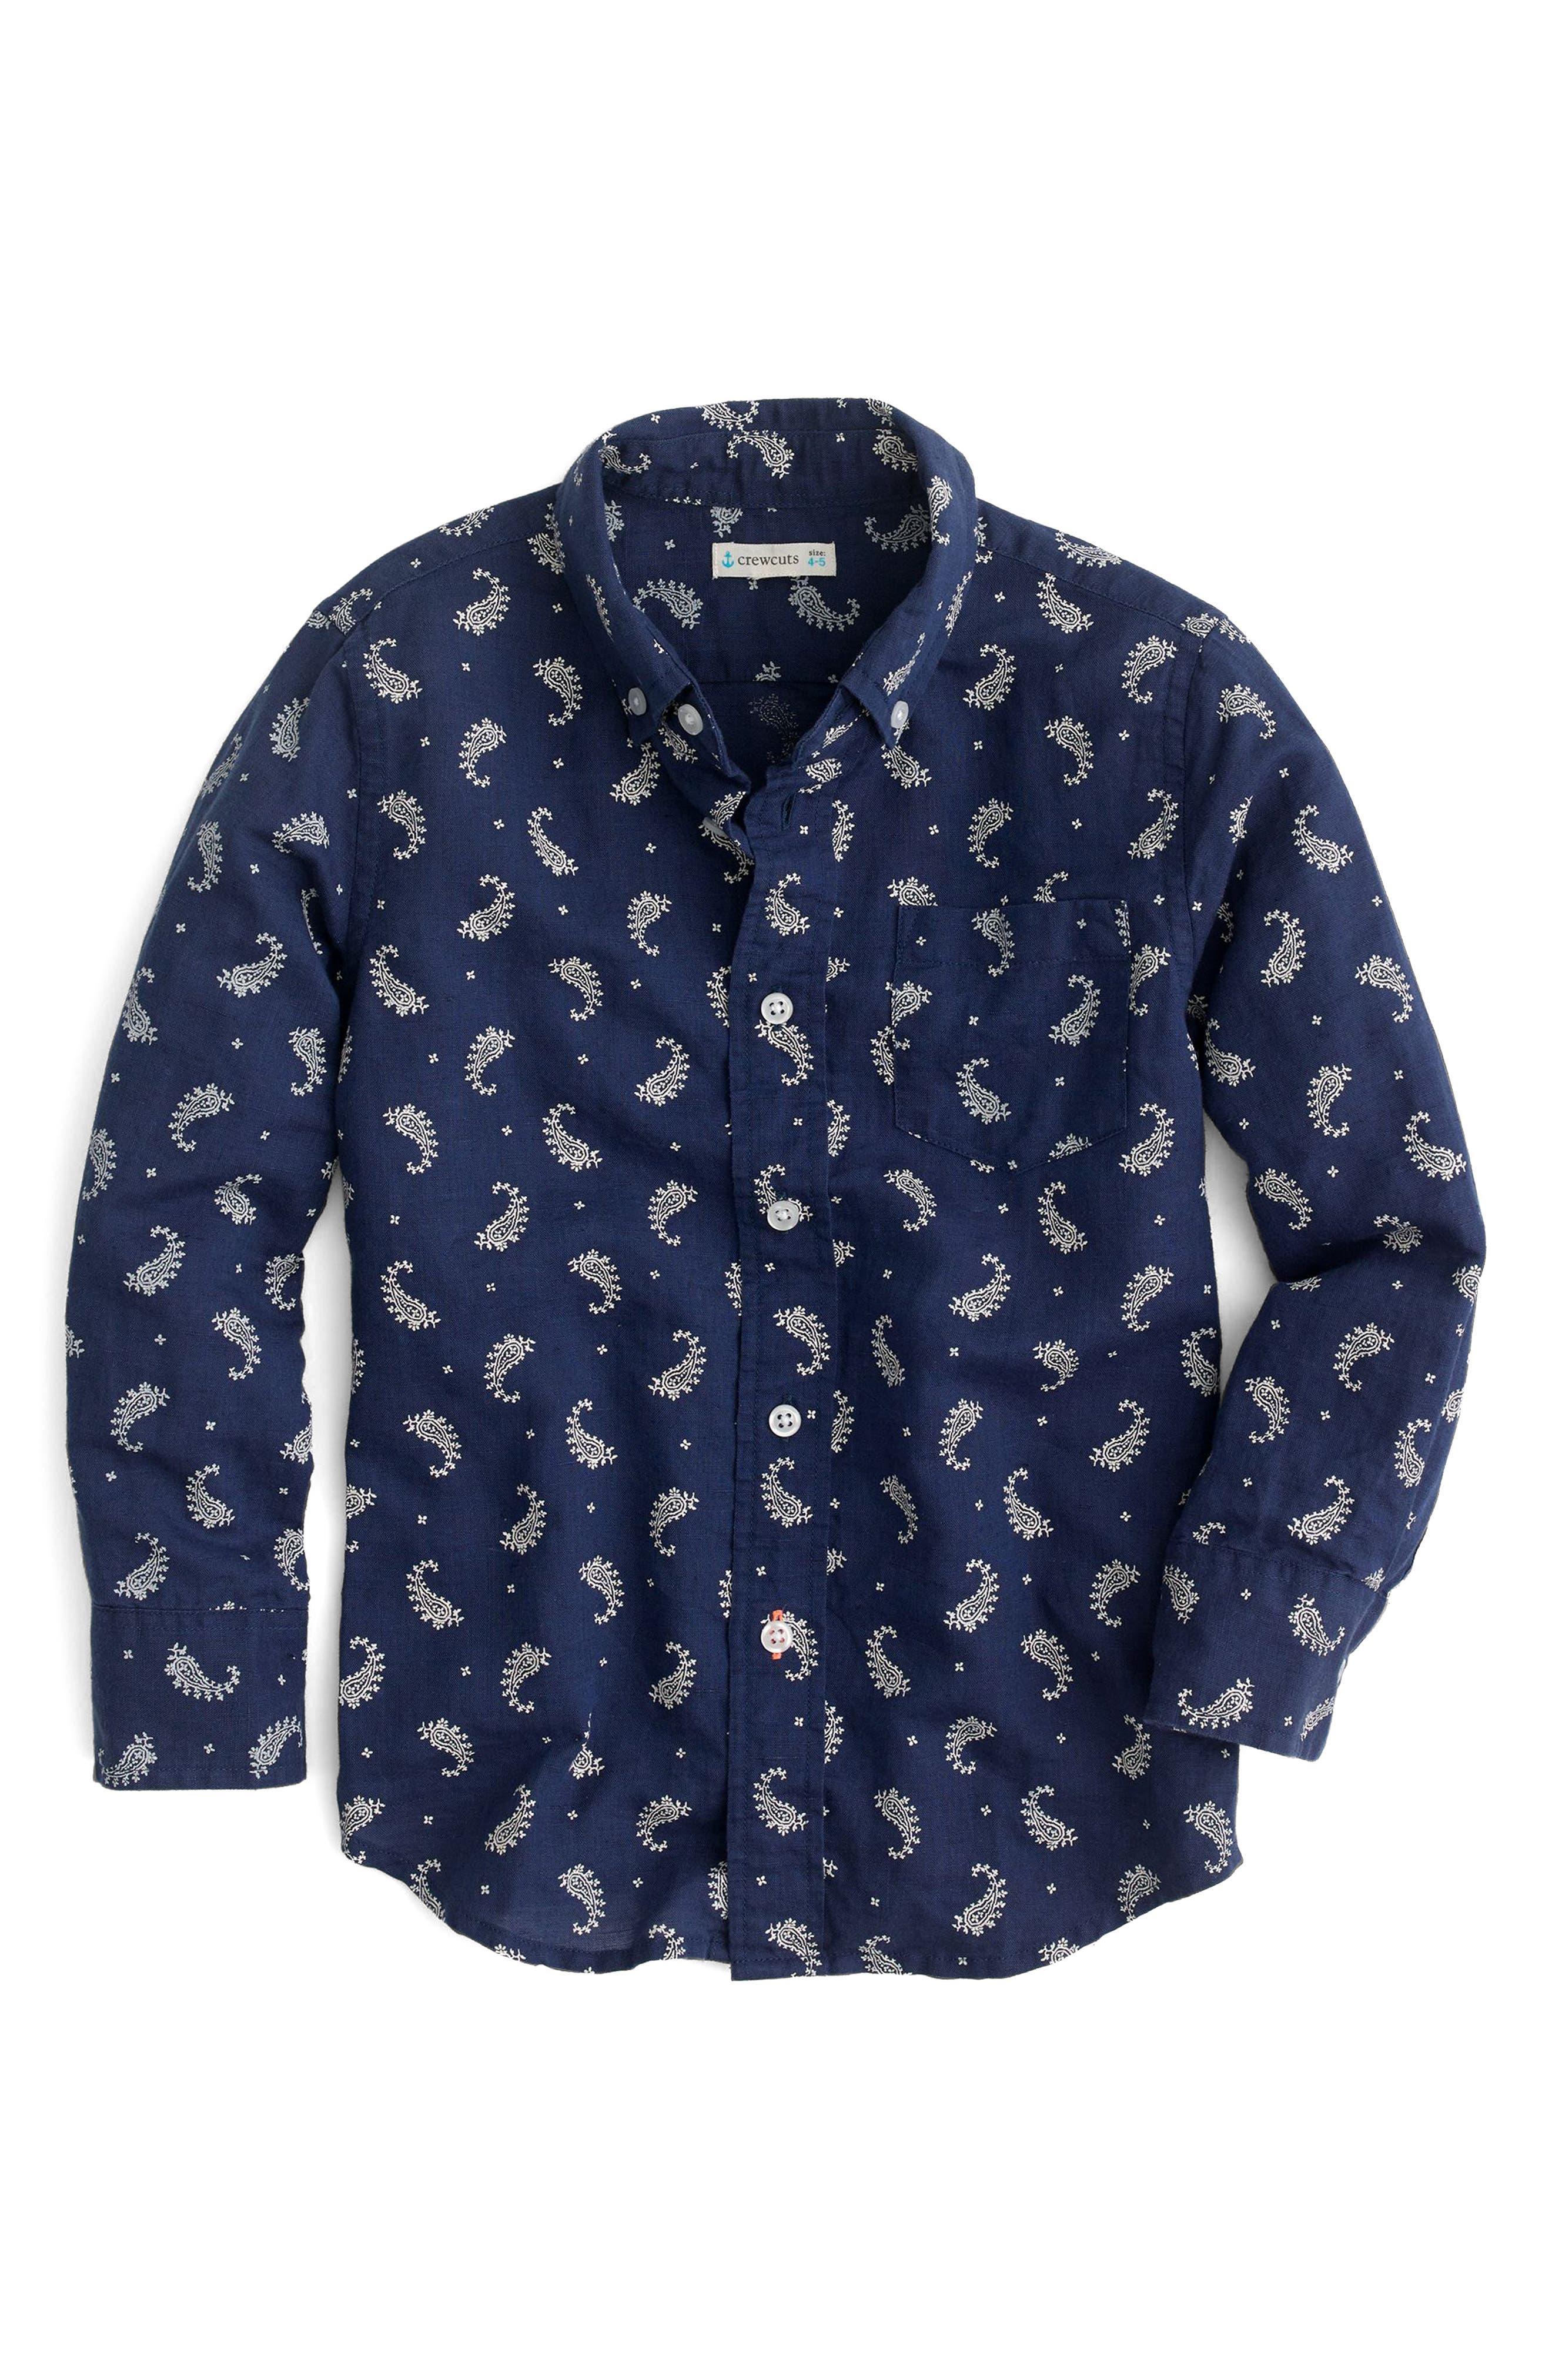 CREWCUTS BY J.CREW Paisley Print Cotton & Linen Dress Shirt, Main, color, 400